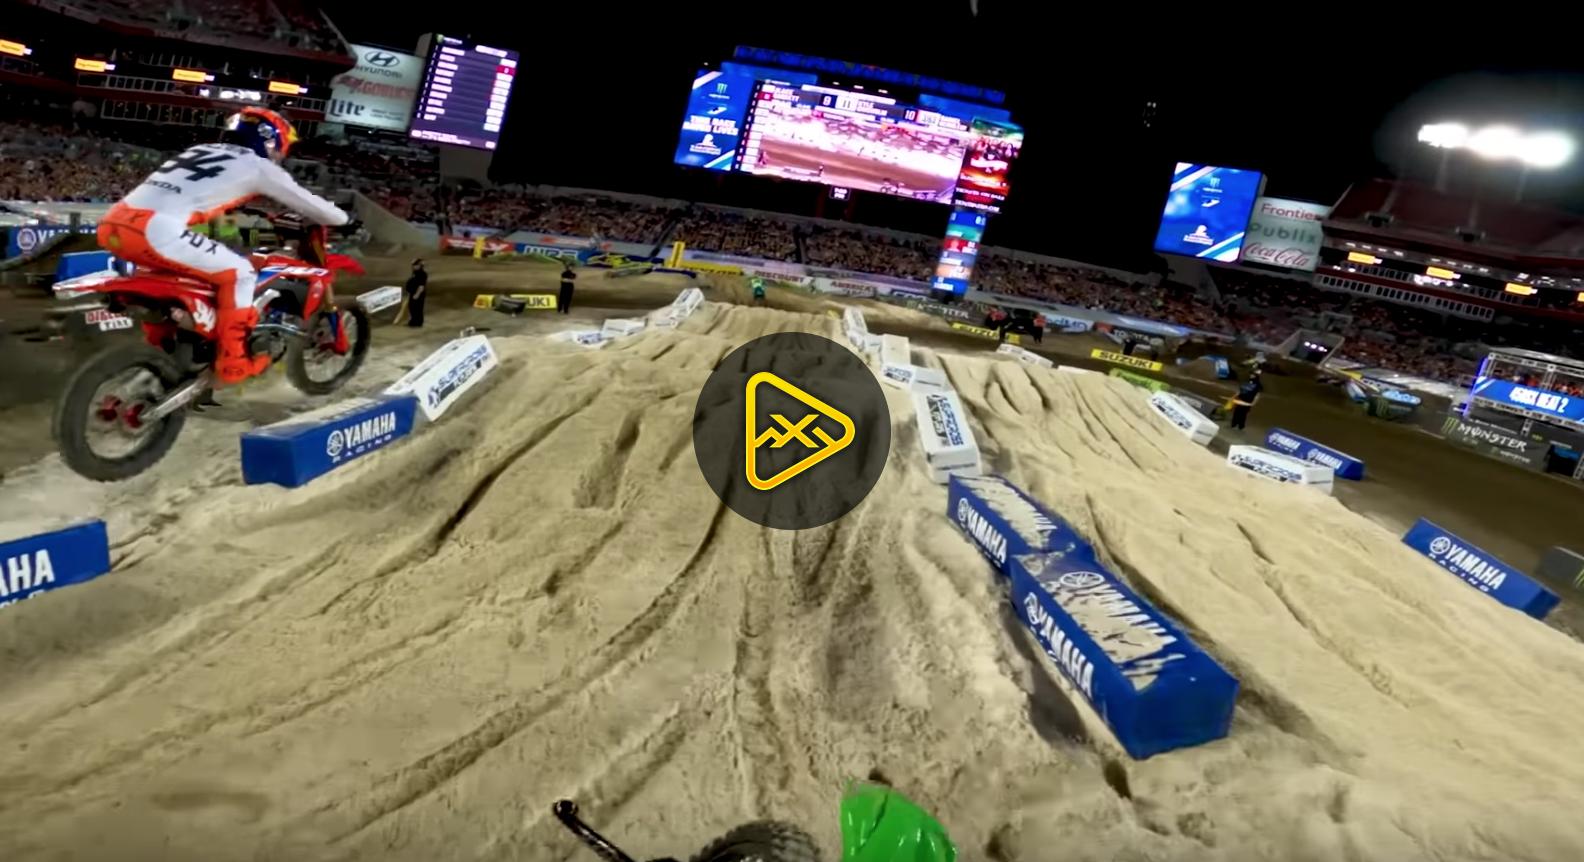 GoPro: Adam Cianciarulo and Ken Roczen Battle at Tampa